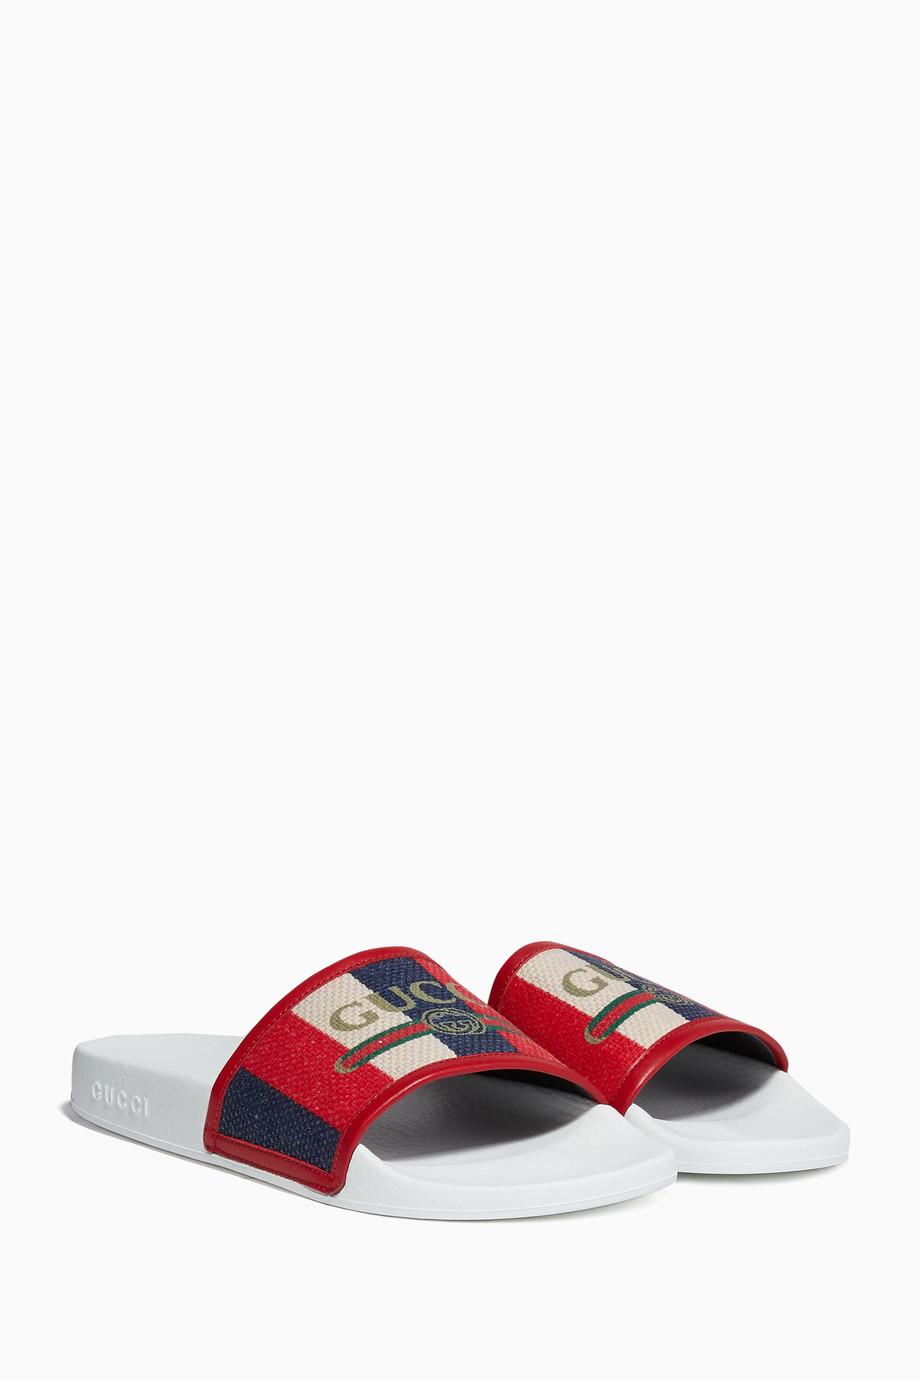 f4632611f Shop Gucci Multicolour Red Logo Striped Sylvie Slide Sandals for ...